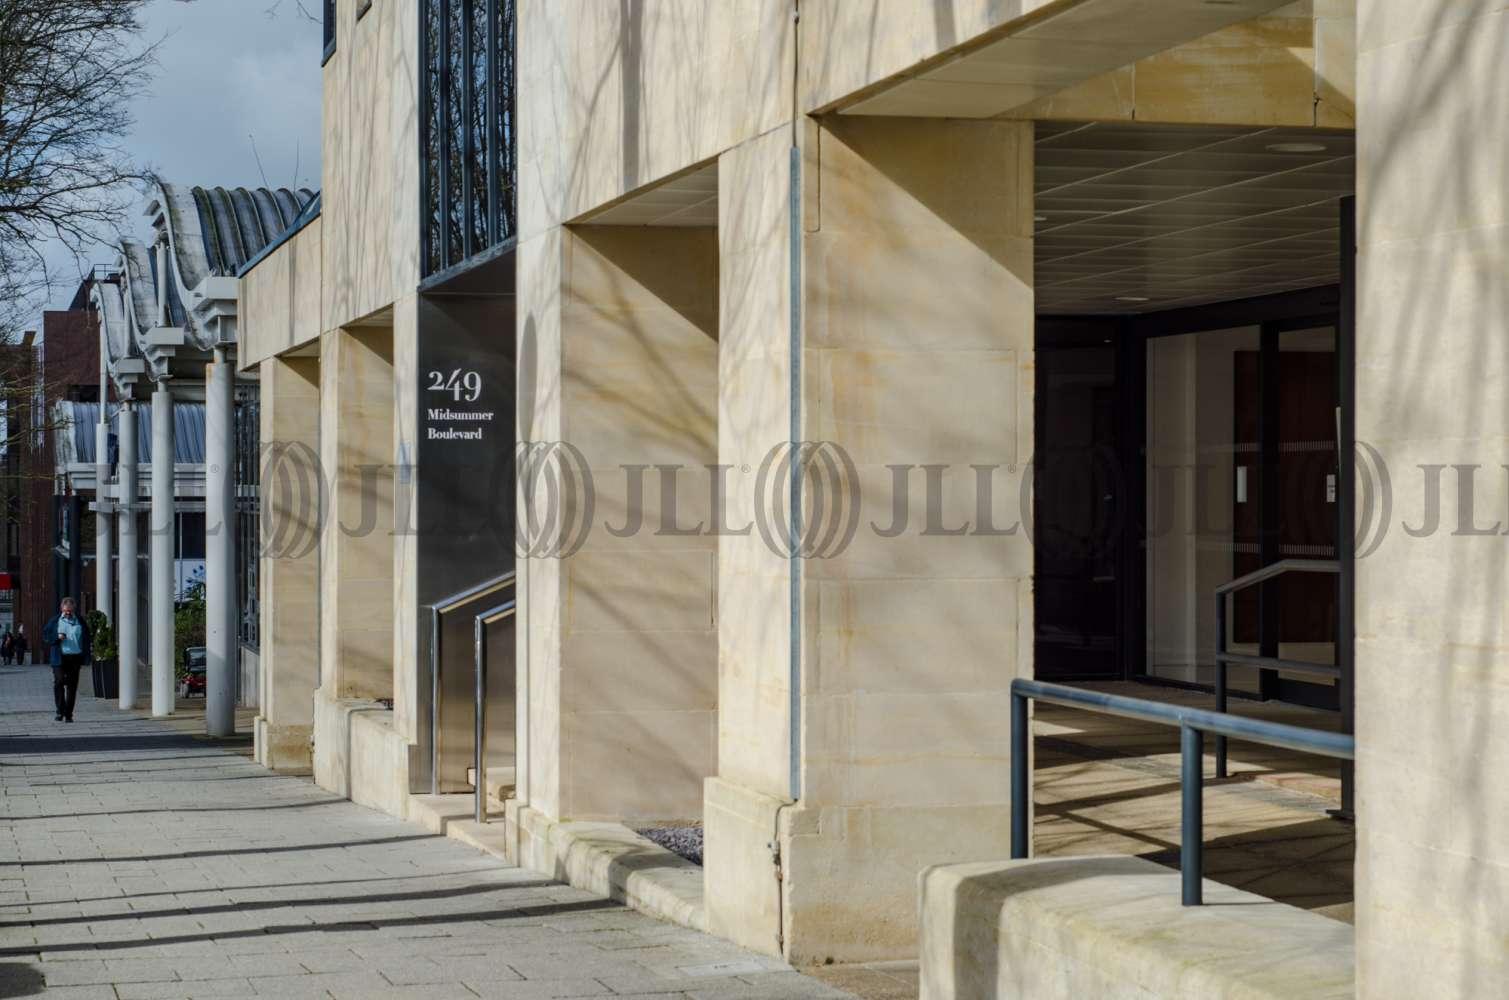 Office Milton keynes, MK9 1EA - 249 Midsummer Boulevard - 19